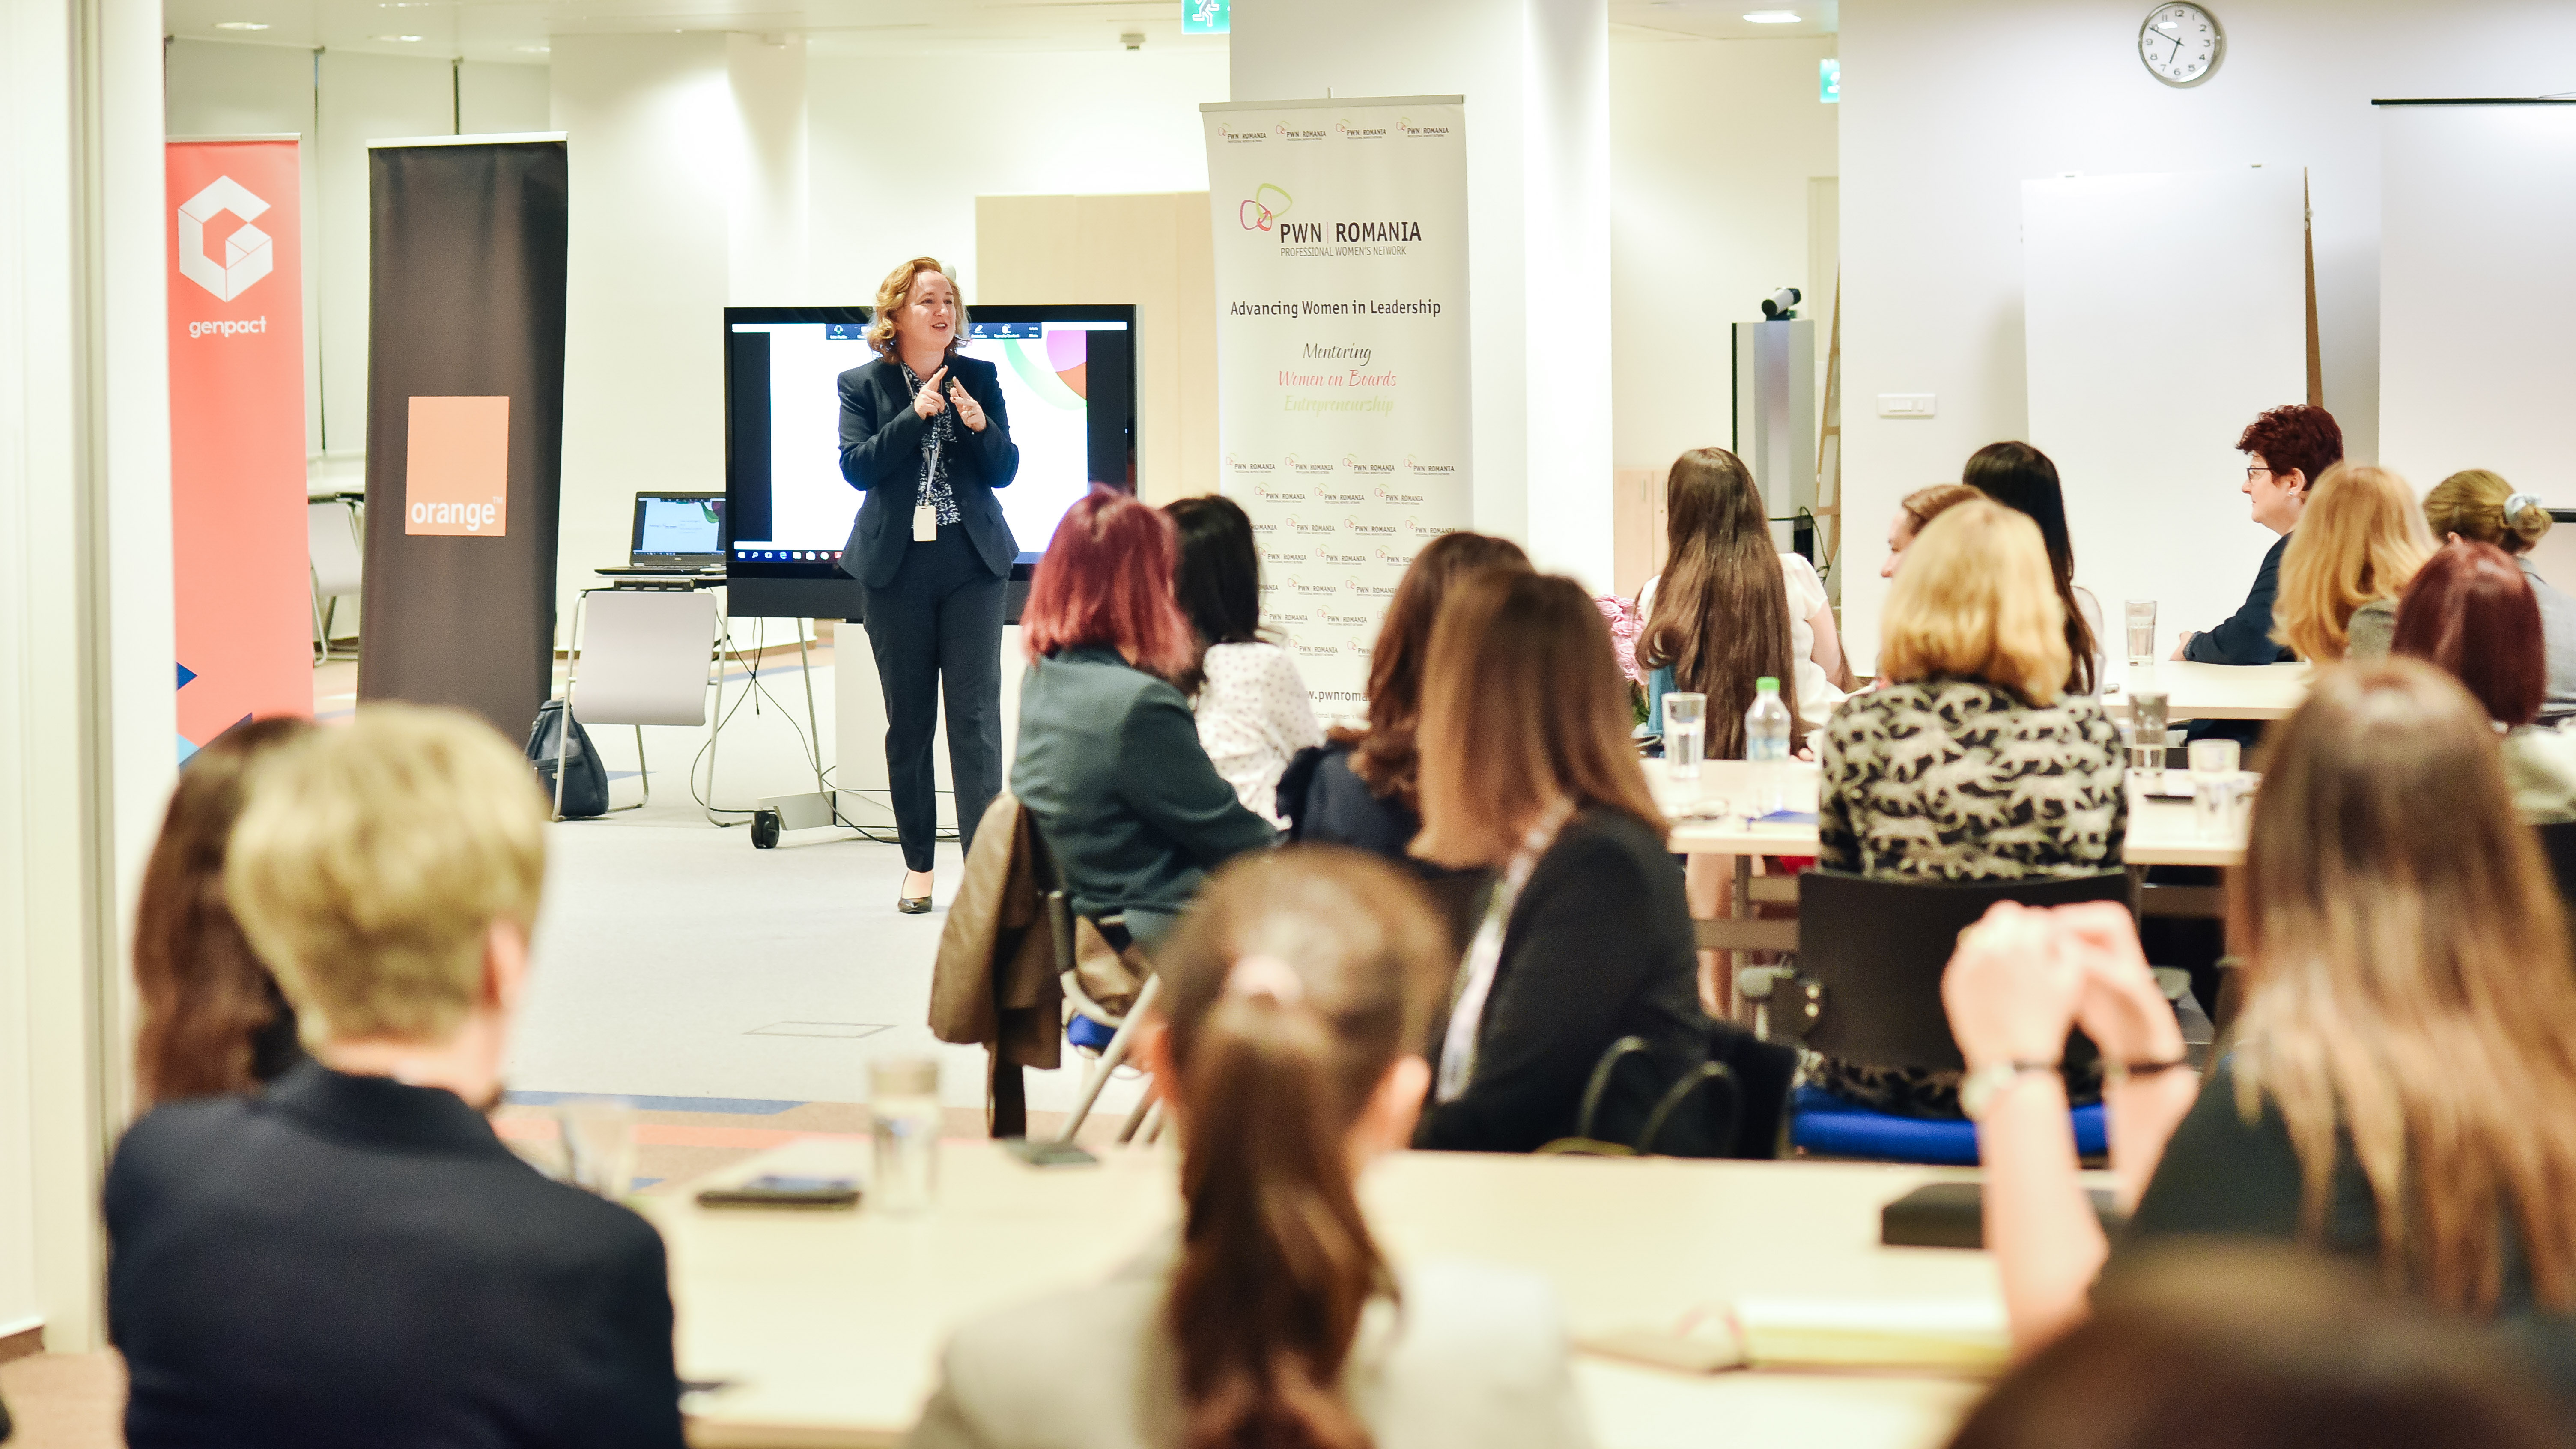 PWN Romania - Mentoring Program